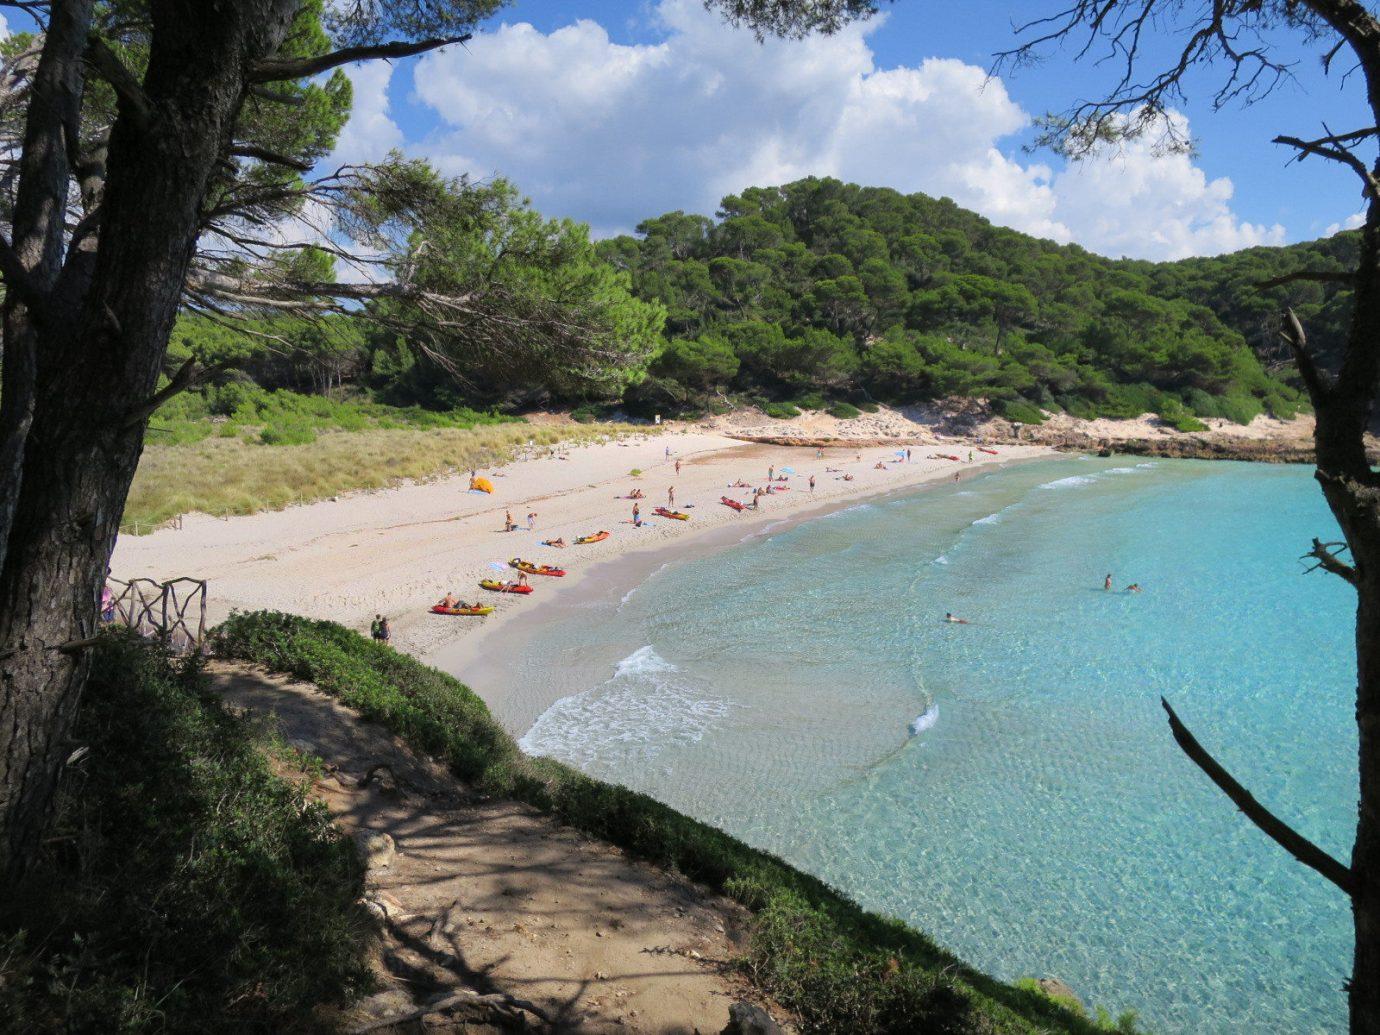 Trip Ideas tree outdoor water sky Beach Nature body of water Coast Sea shore vacation bay River cove tropics Lagoon lined